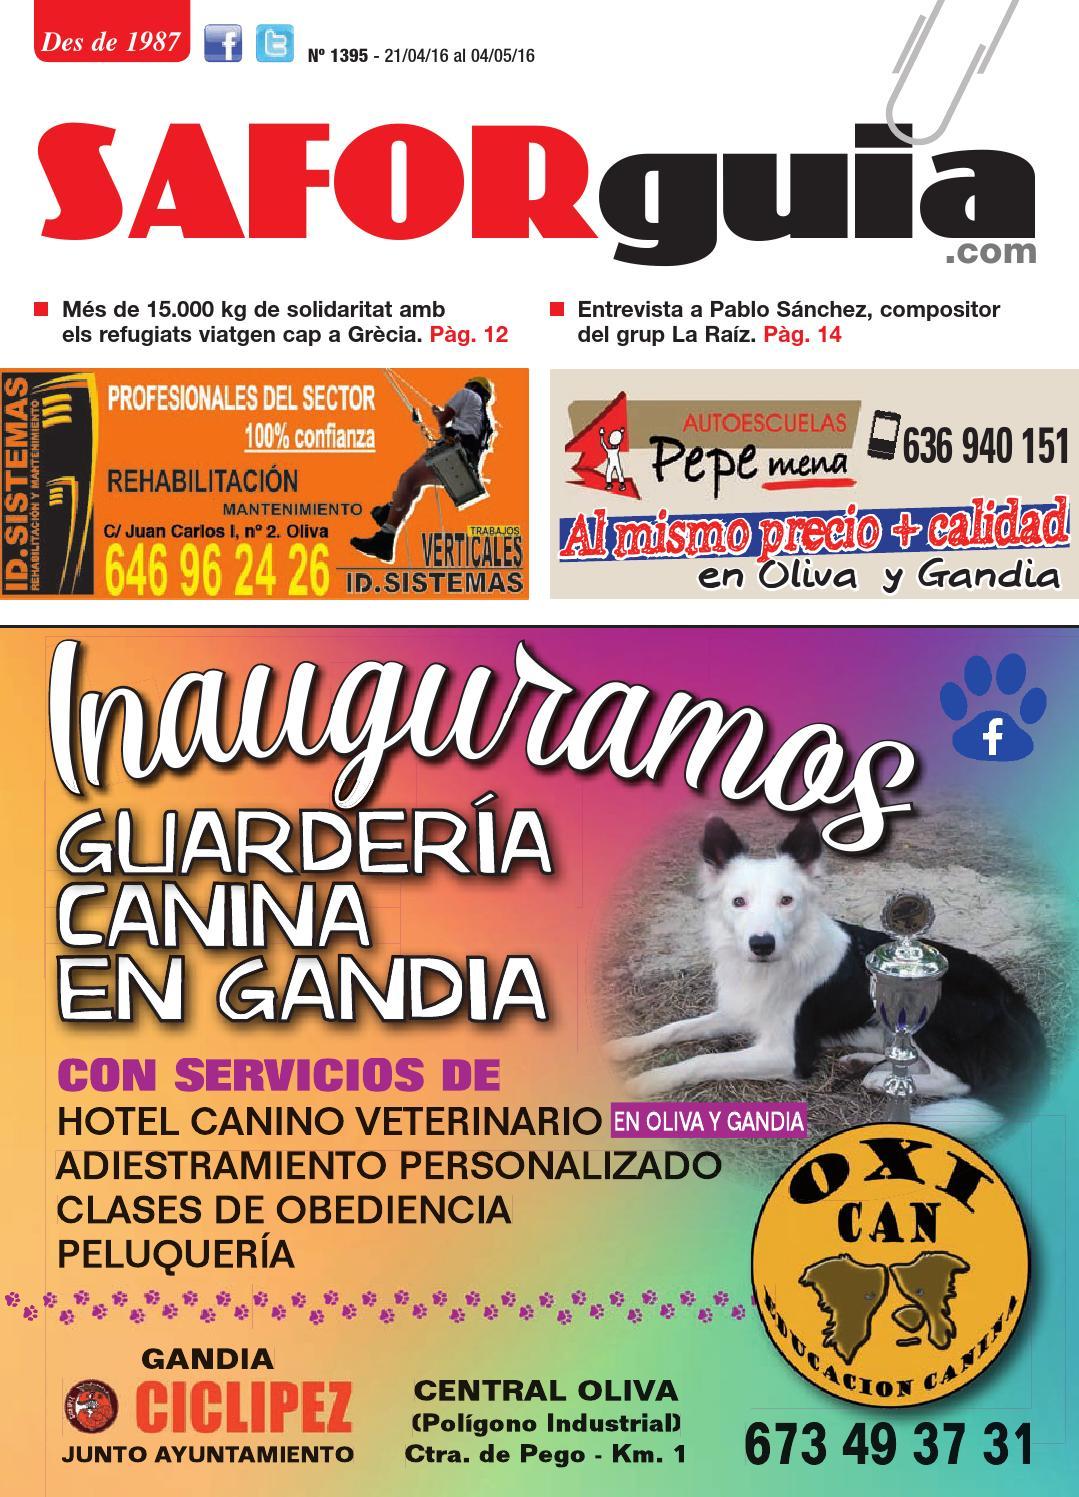 Publicaci N Del 21 De Abril Al 4 De Mayo De 2016 By Saforguia  # Muebles Peiro Quart De Poblet